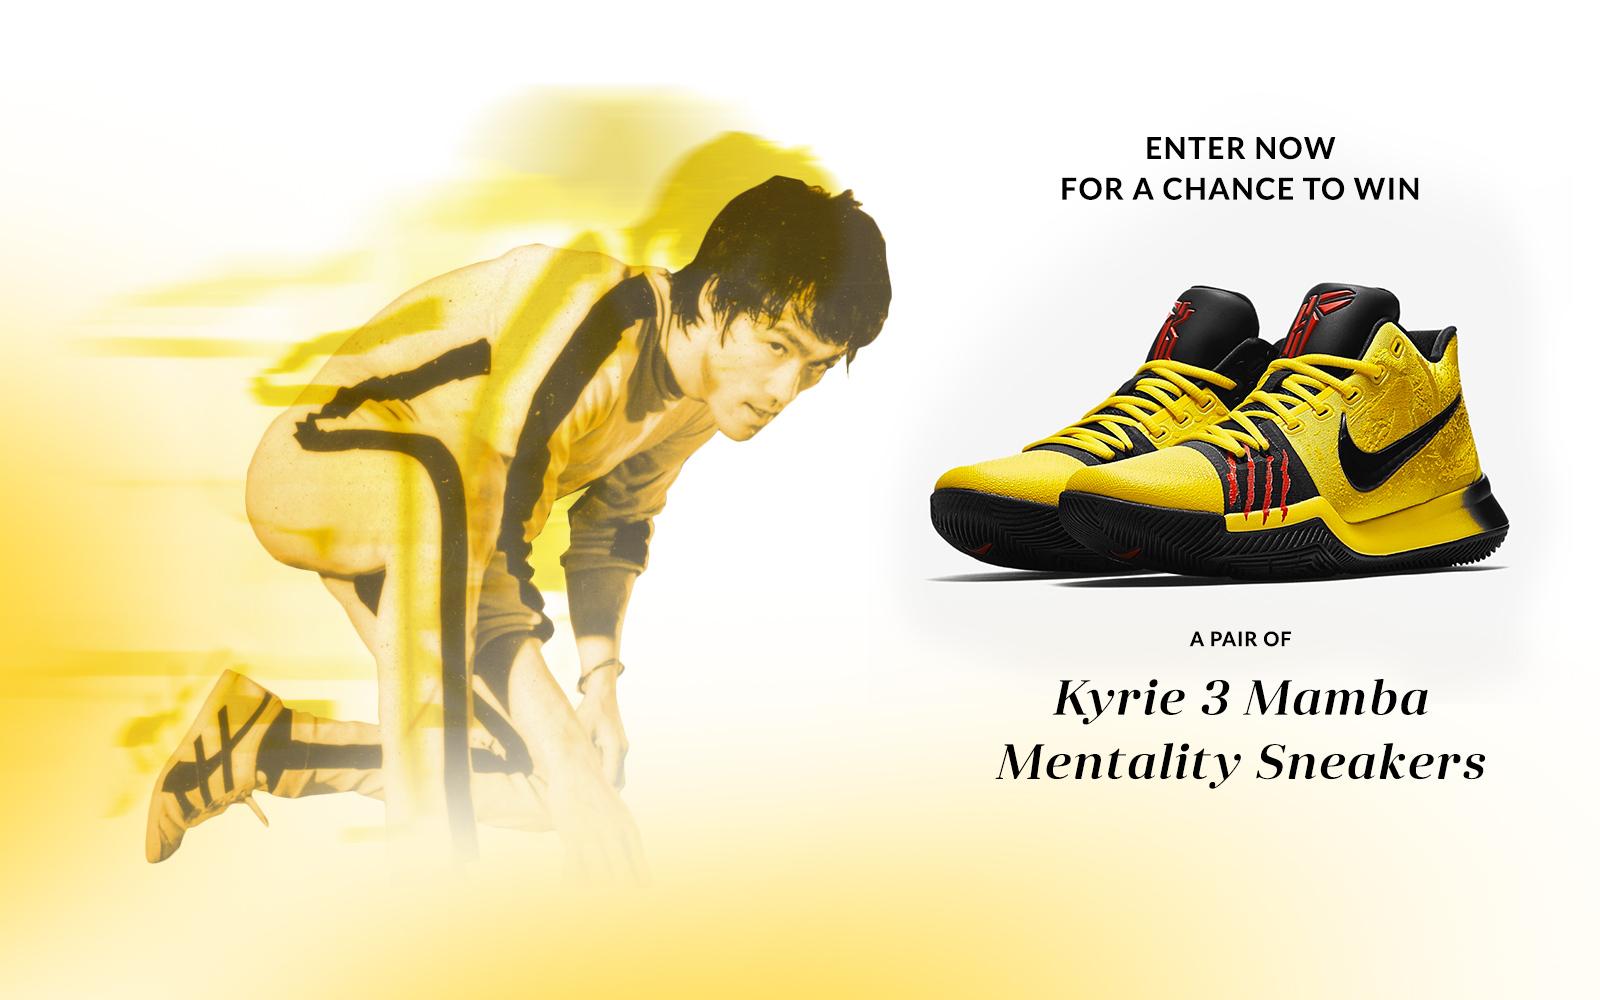 sale retailer 69d20 0e70f Bruce Lee Case Study - ViralSweep